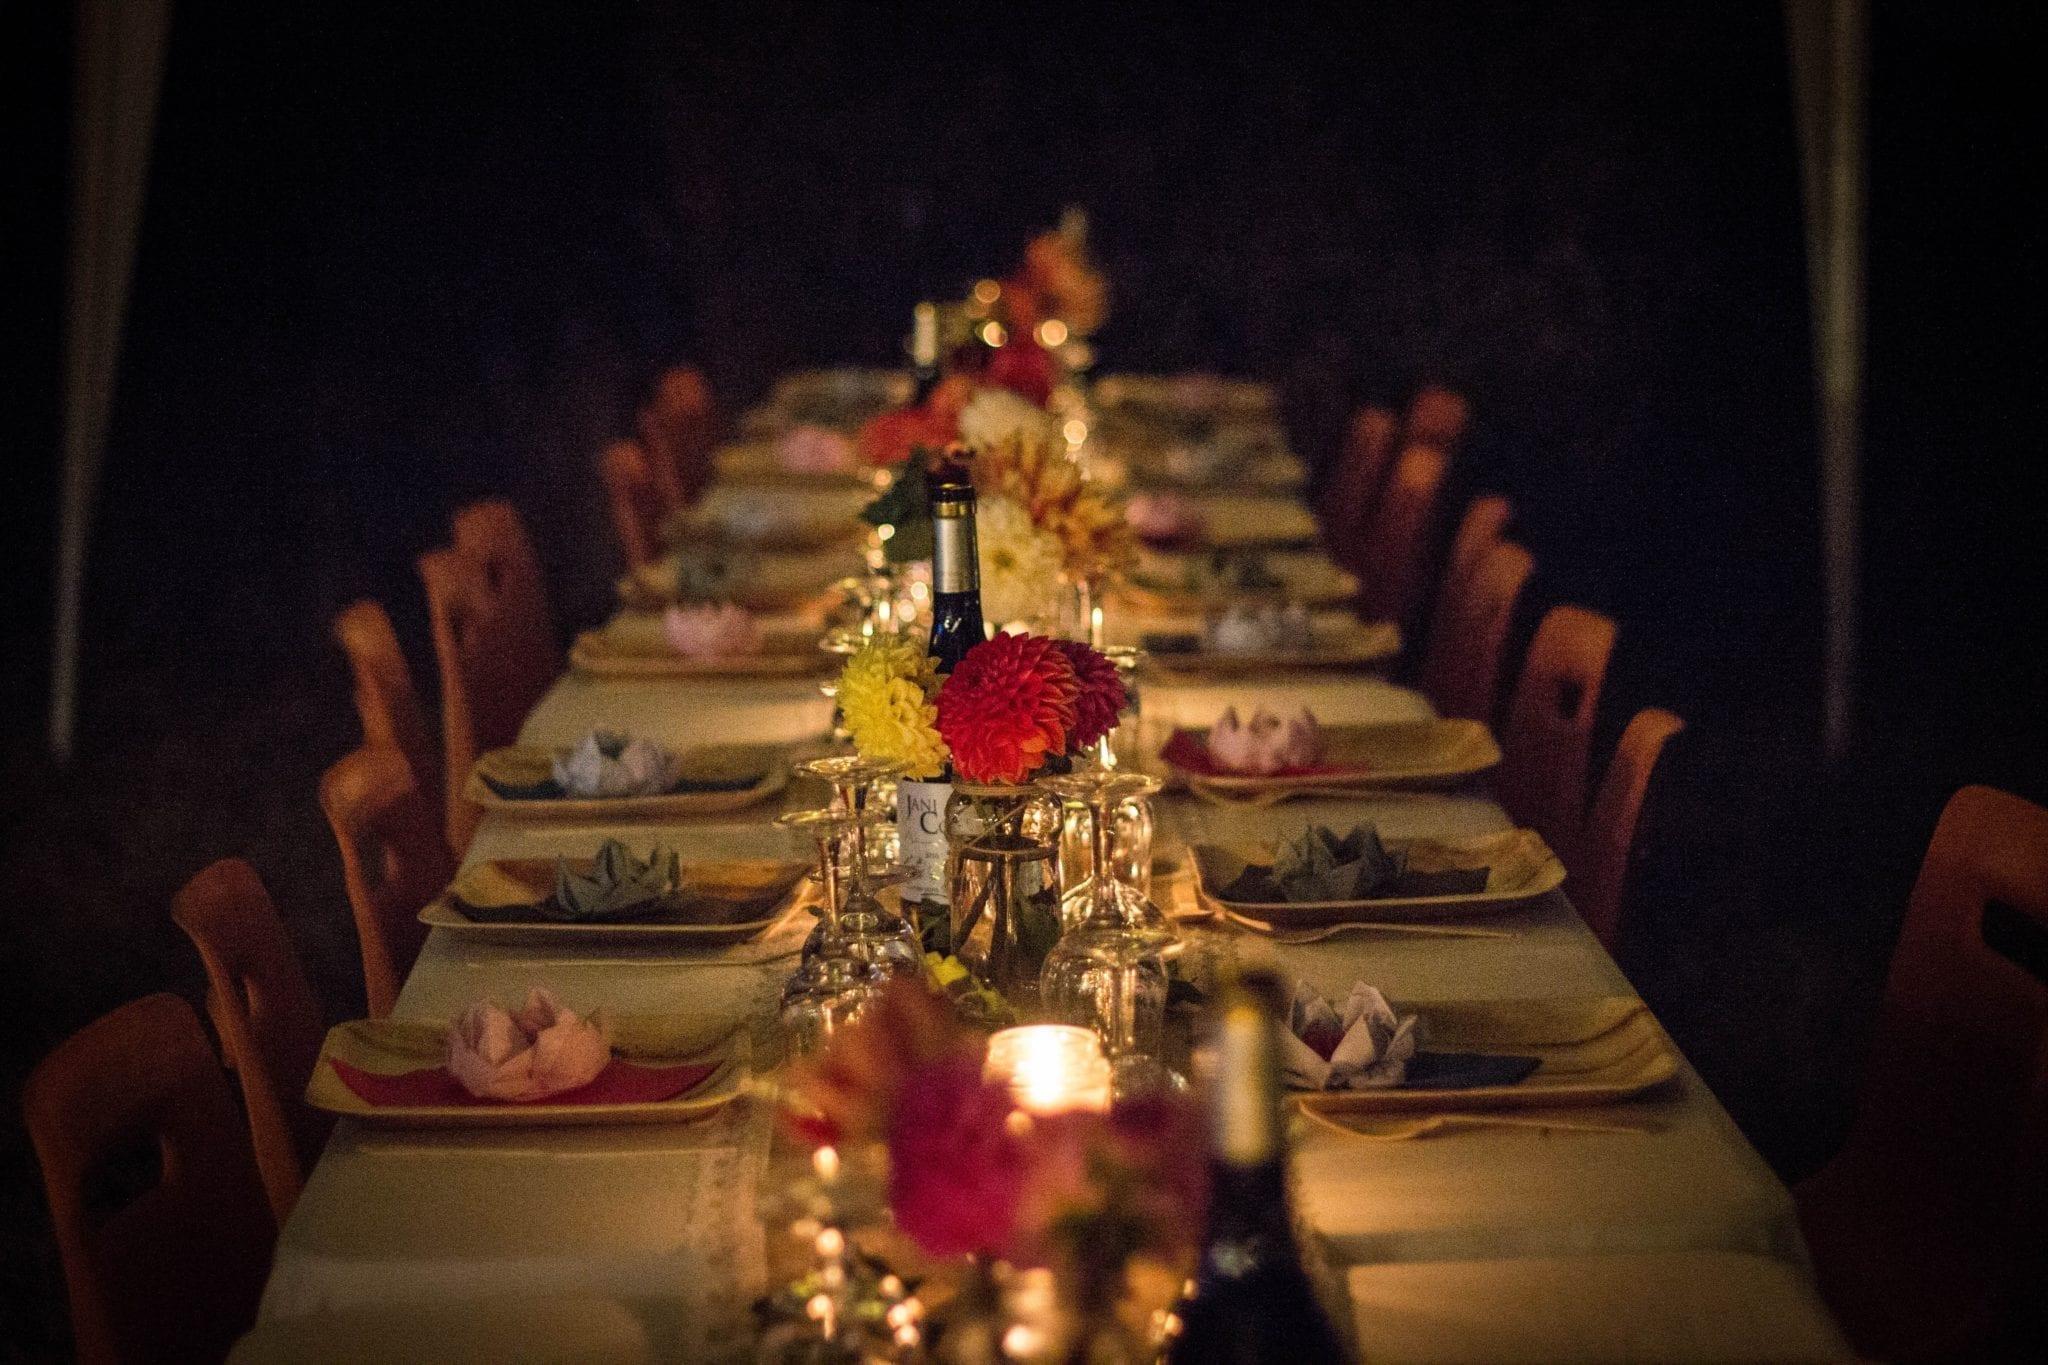 Sådan er du vært for et event om mad og drikke: Arranger bordplanen alfabetisk.